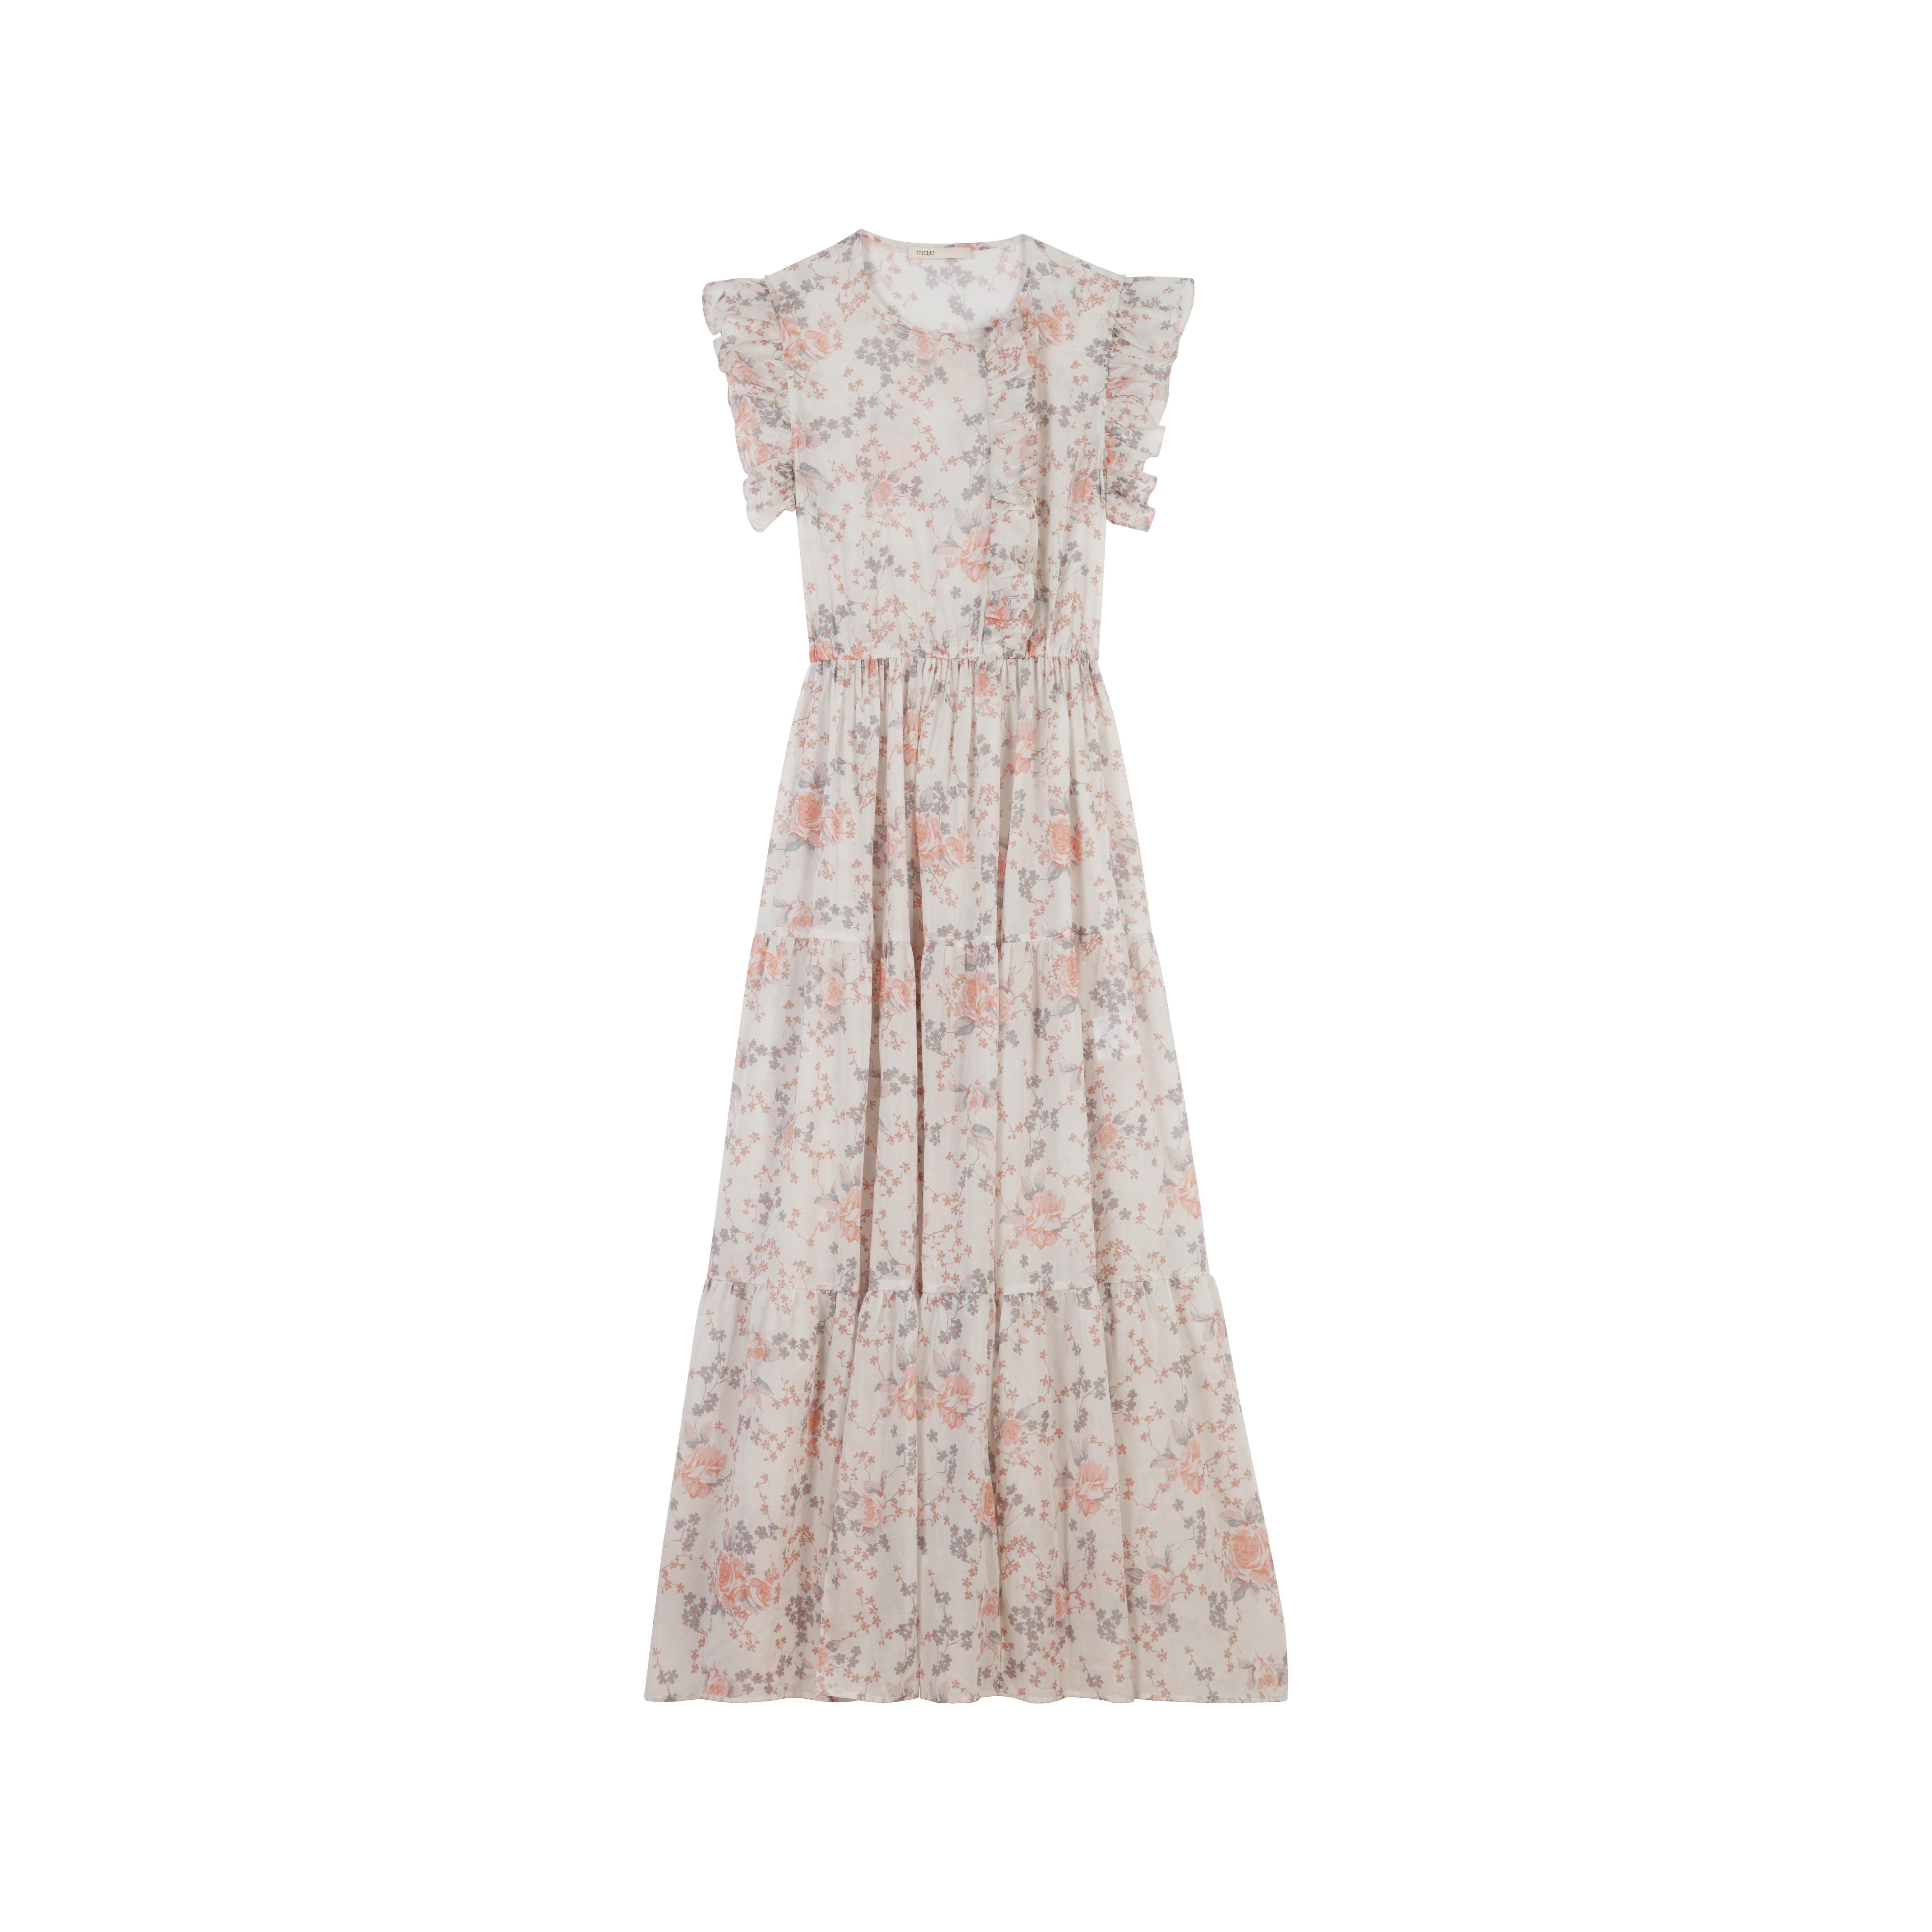 32796c75ff19 Long floral-print ruffled dress - Dresses - MAJE